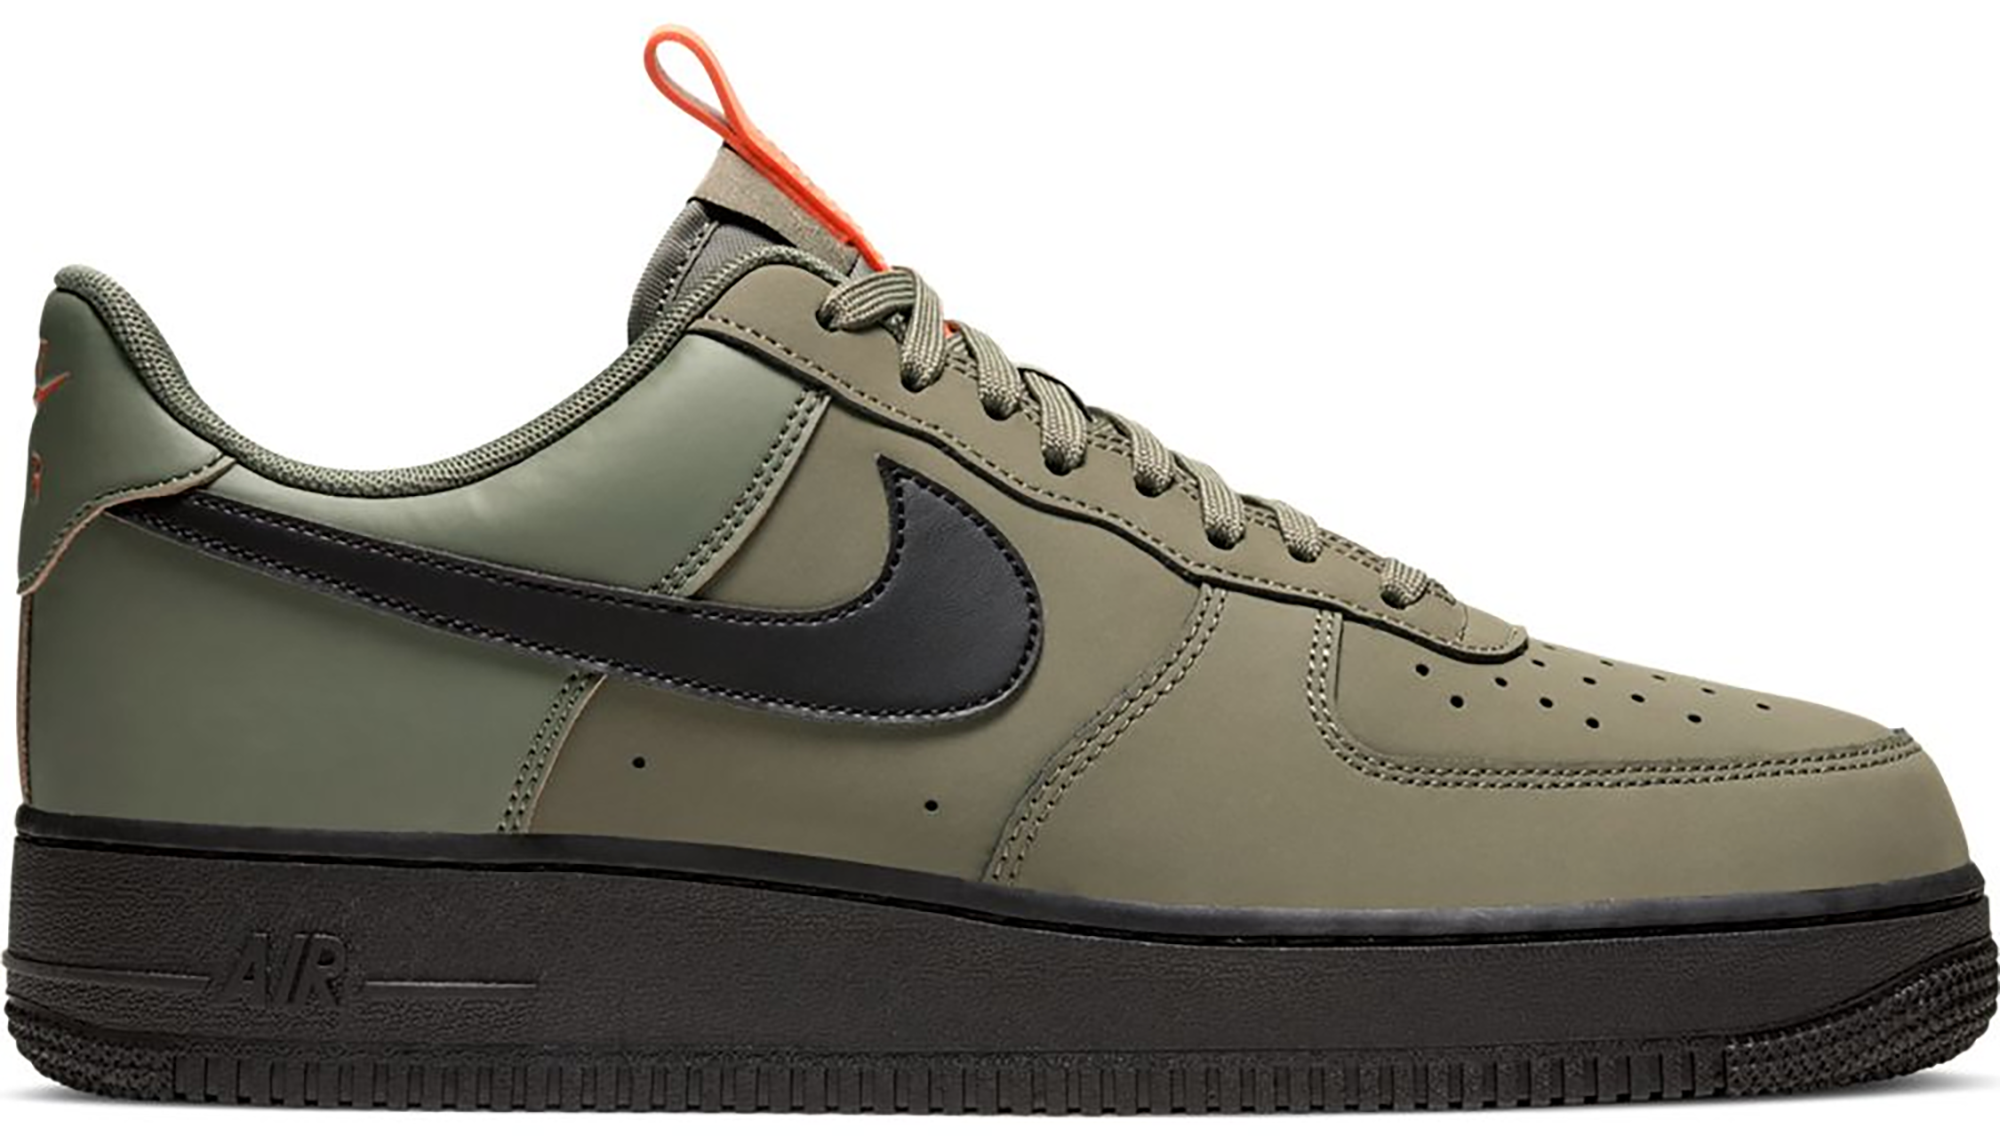 Nike Air Force 1 Low Medium Olive